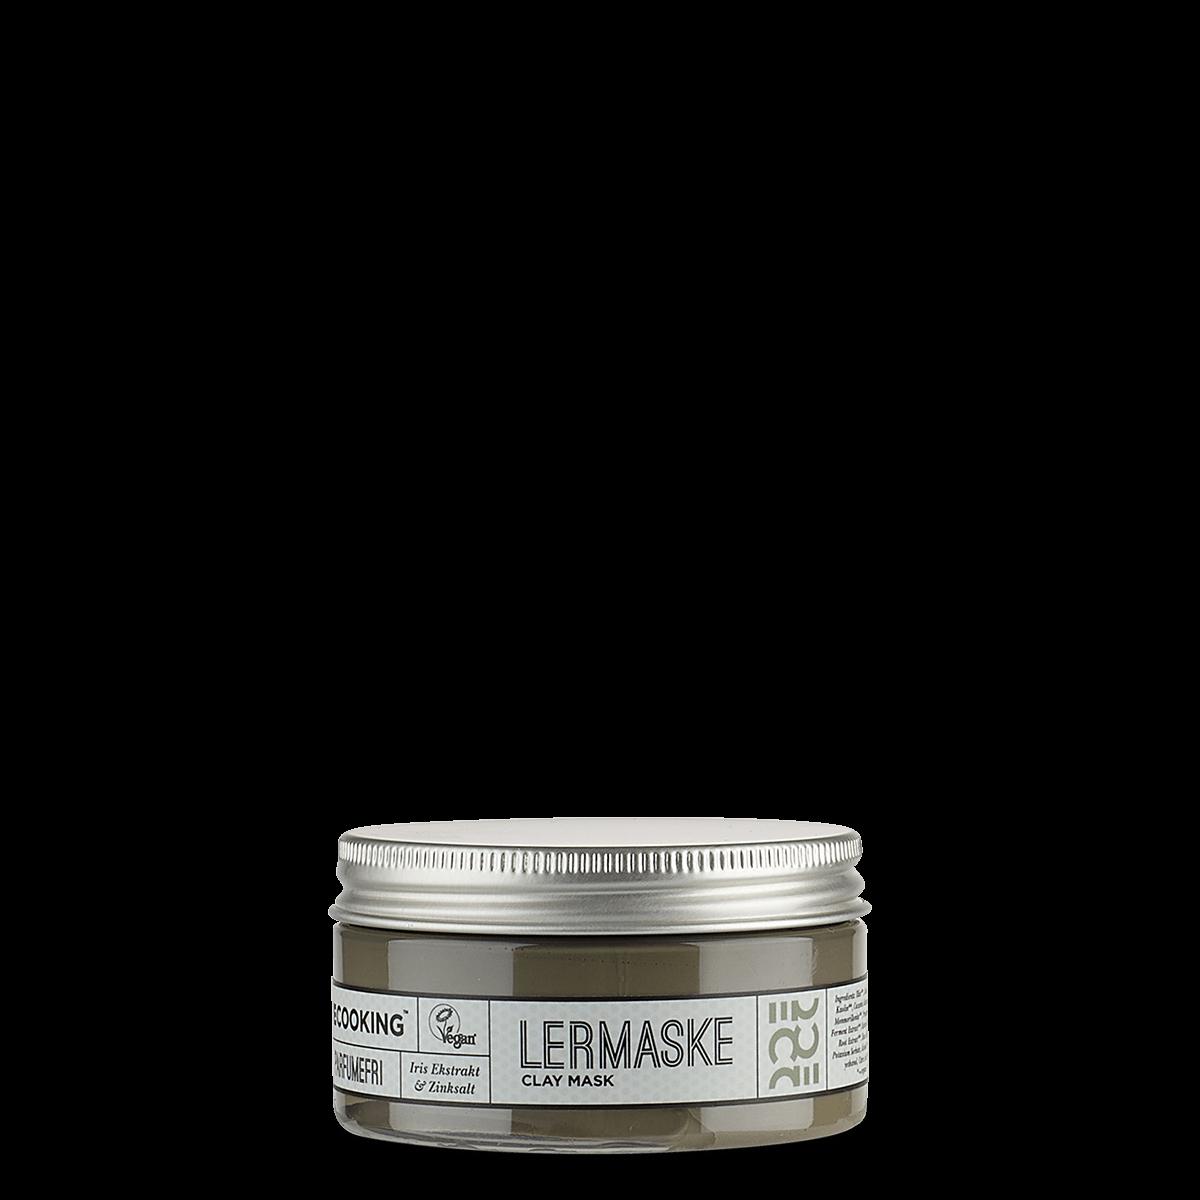 Lermaske 100 ml